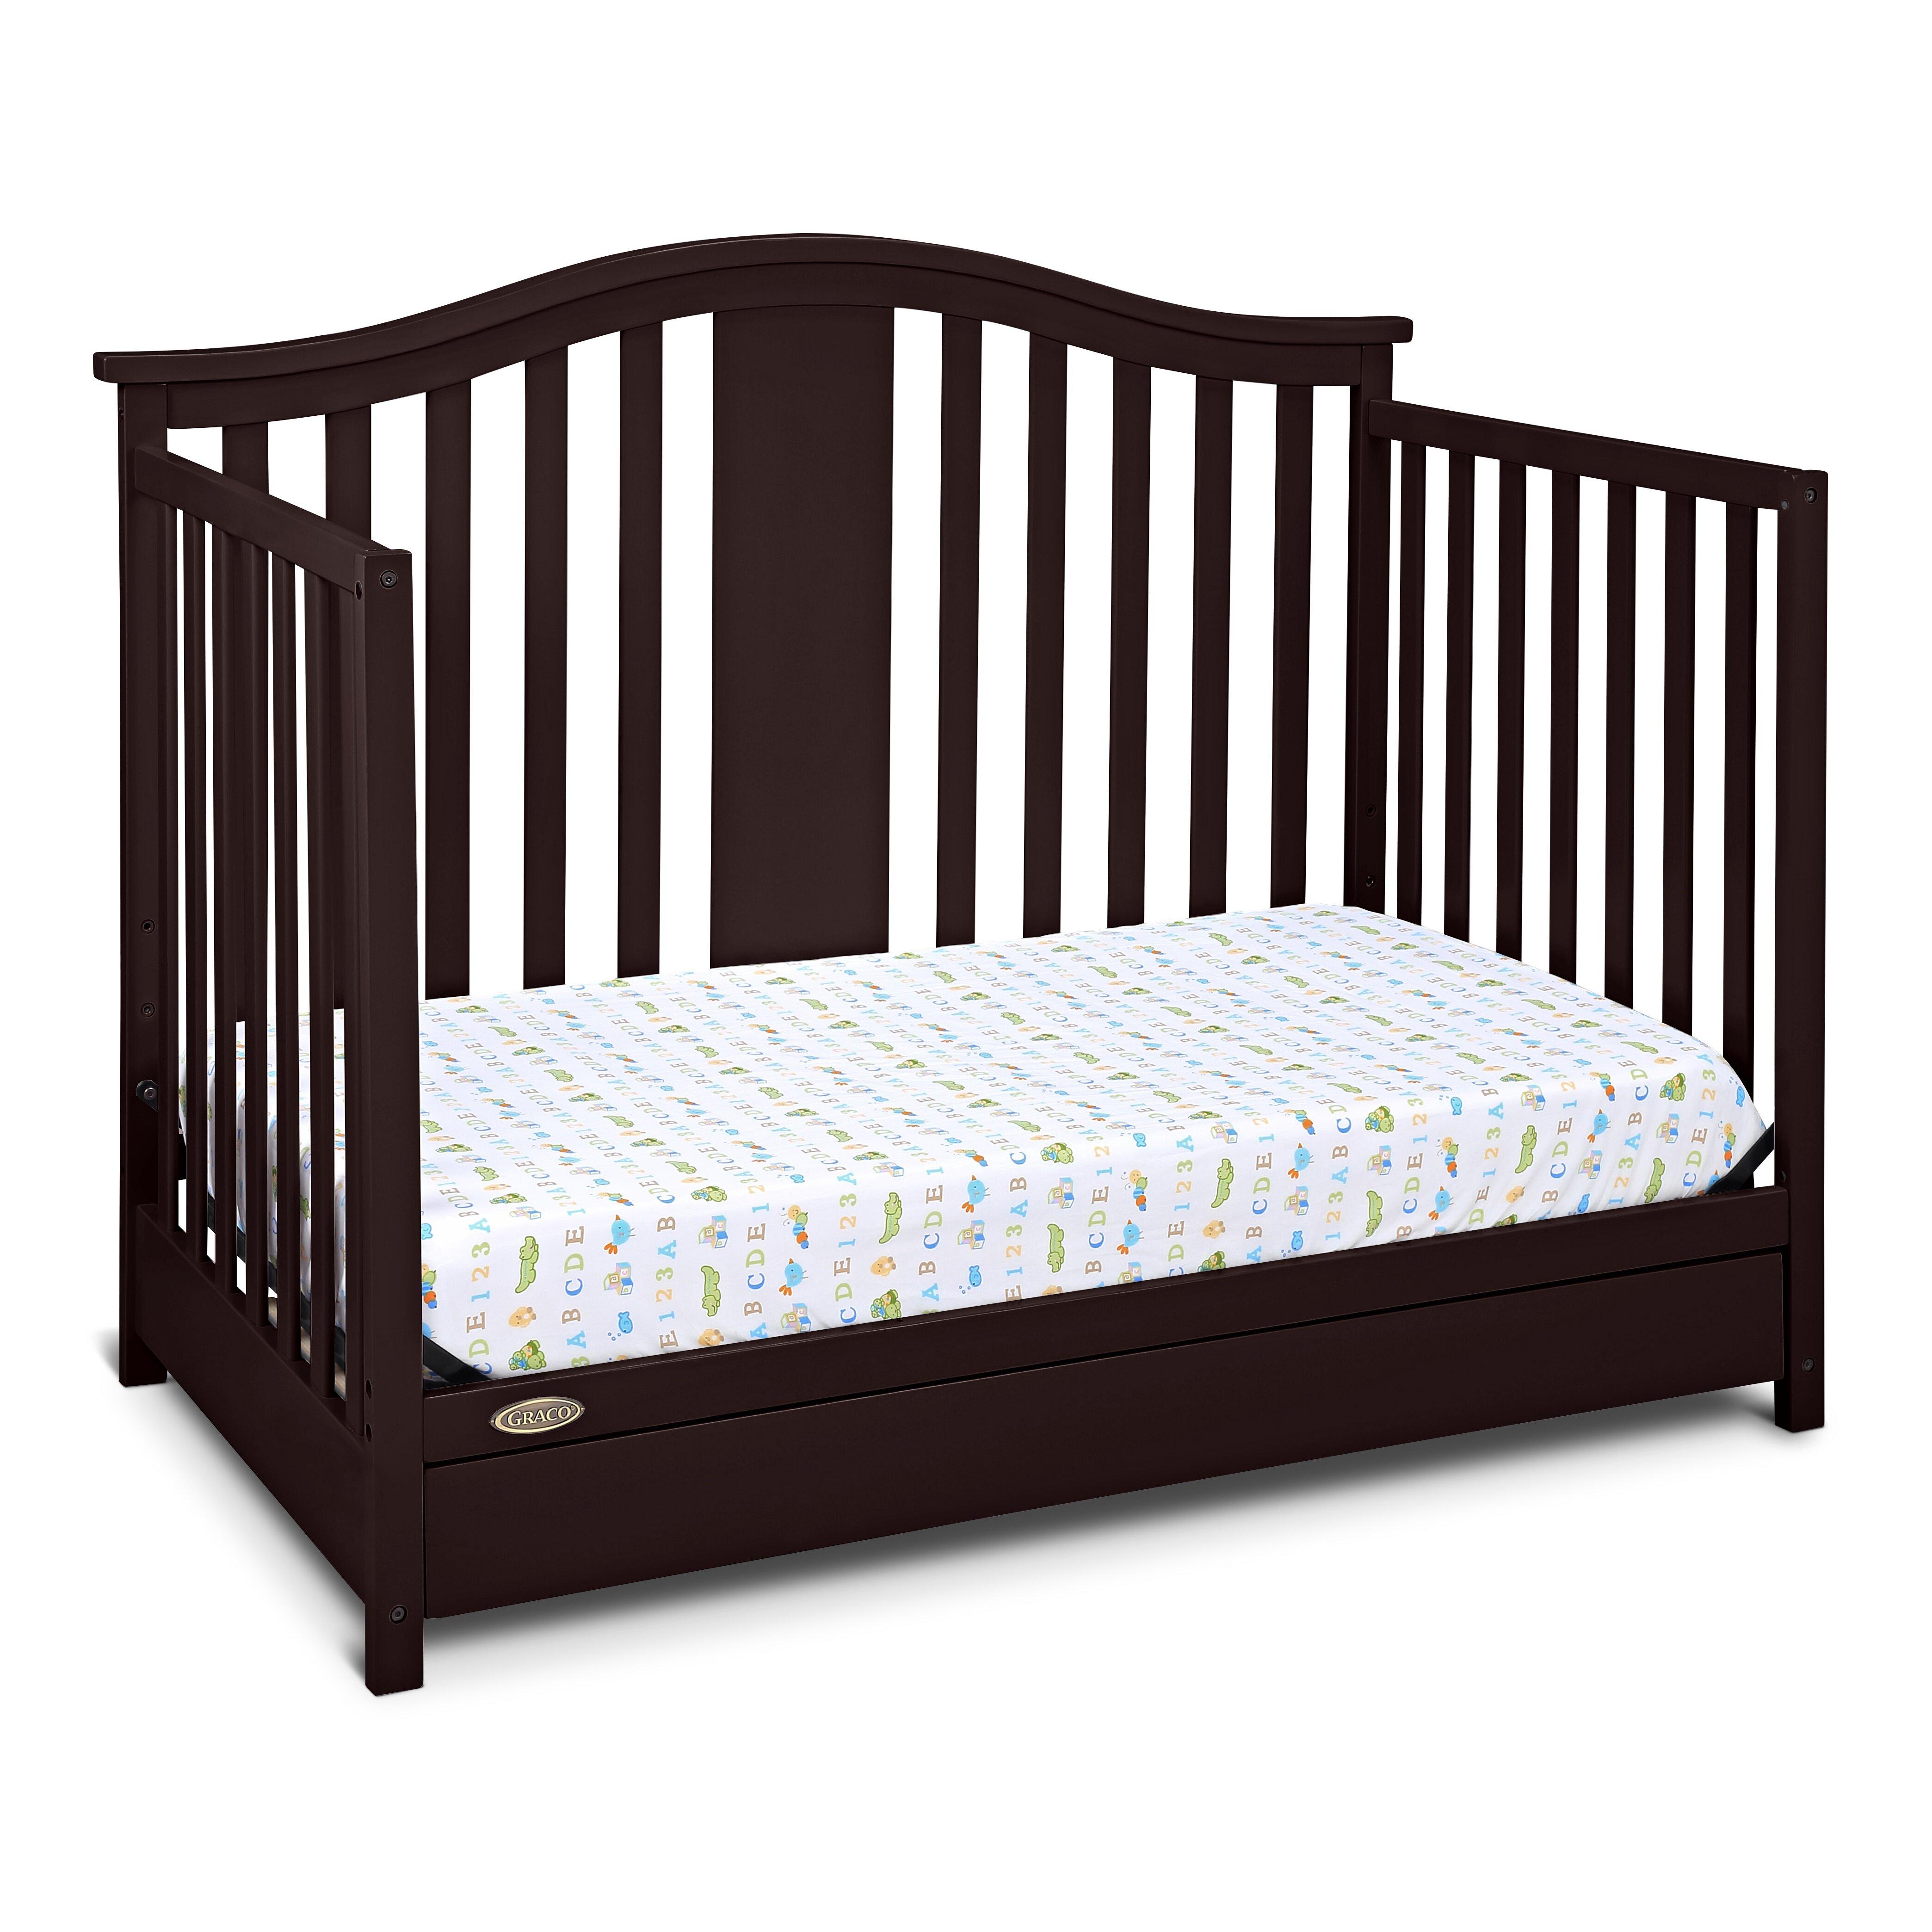 Graco crib for sale manila - Baby Cribs Graco Graco Graco Solano 4 In 1 Convertible Crib With Drawer